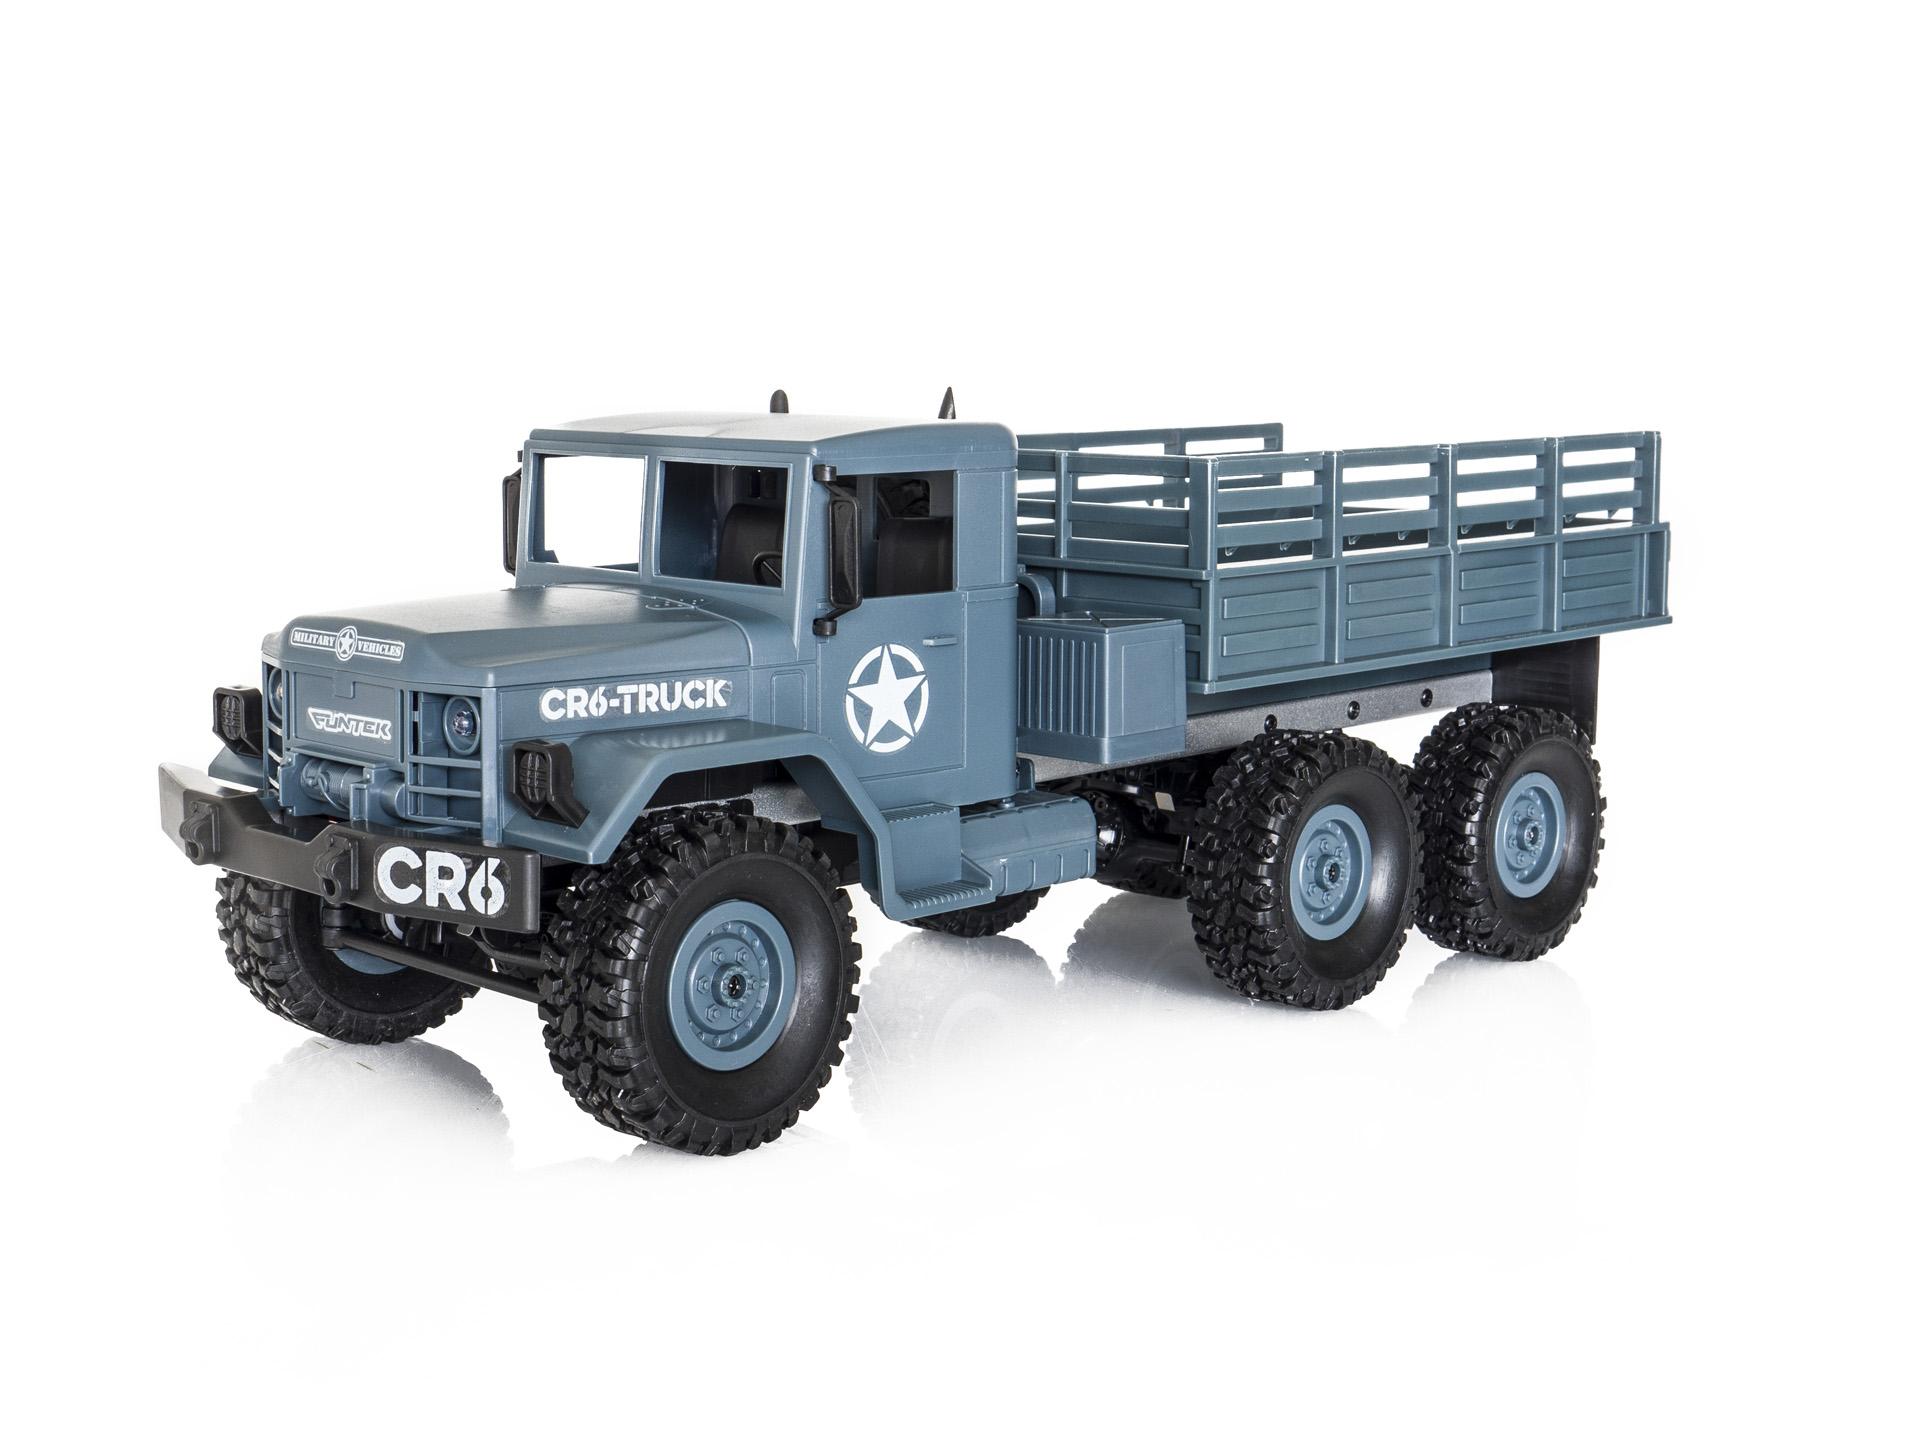 FTK-CR6-BL2